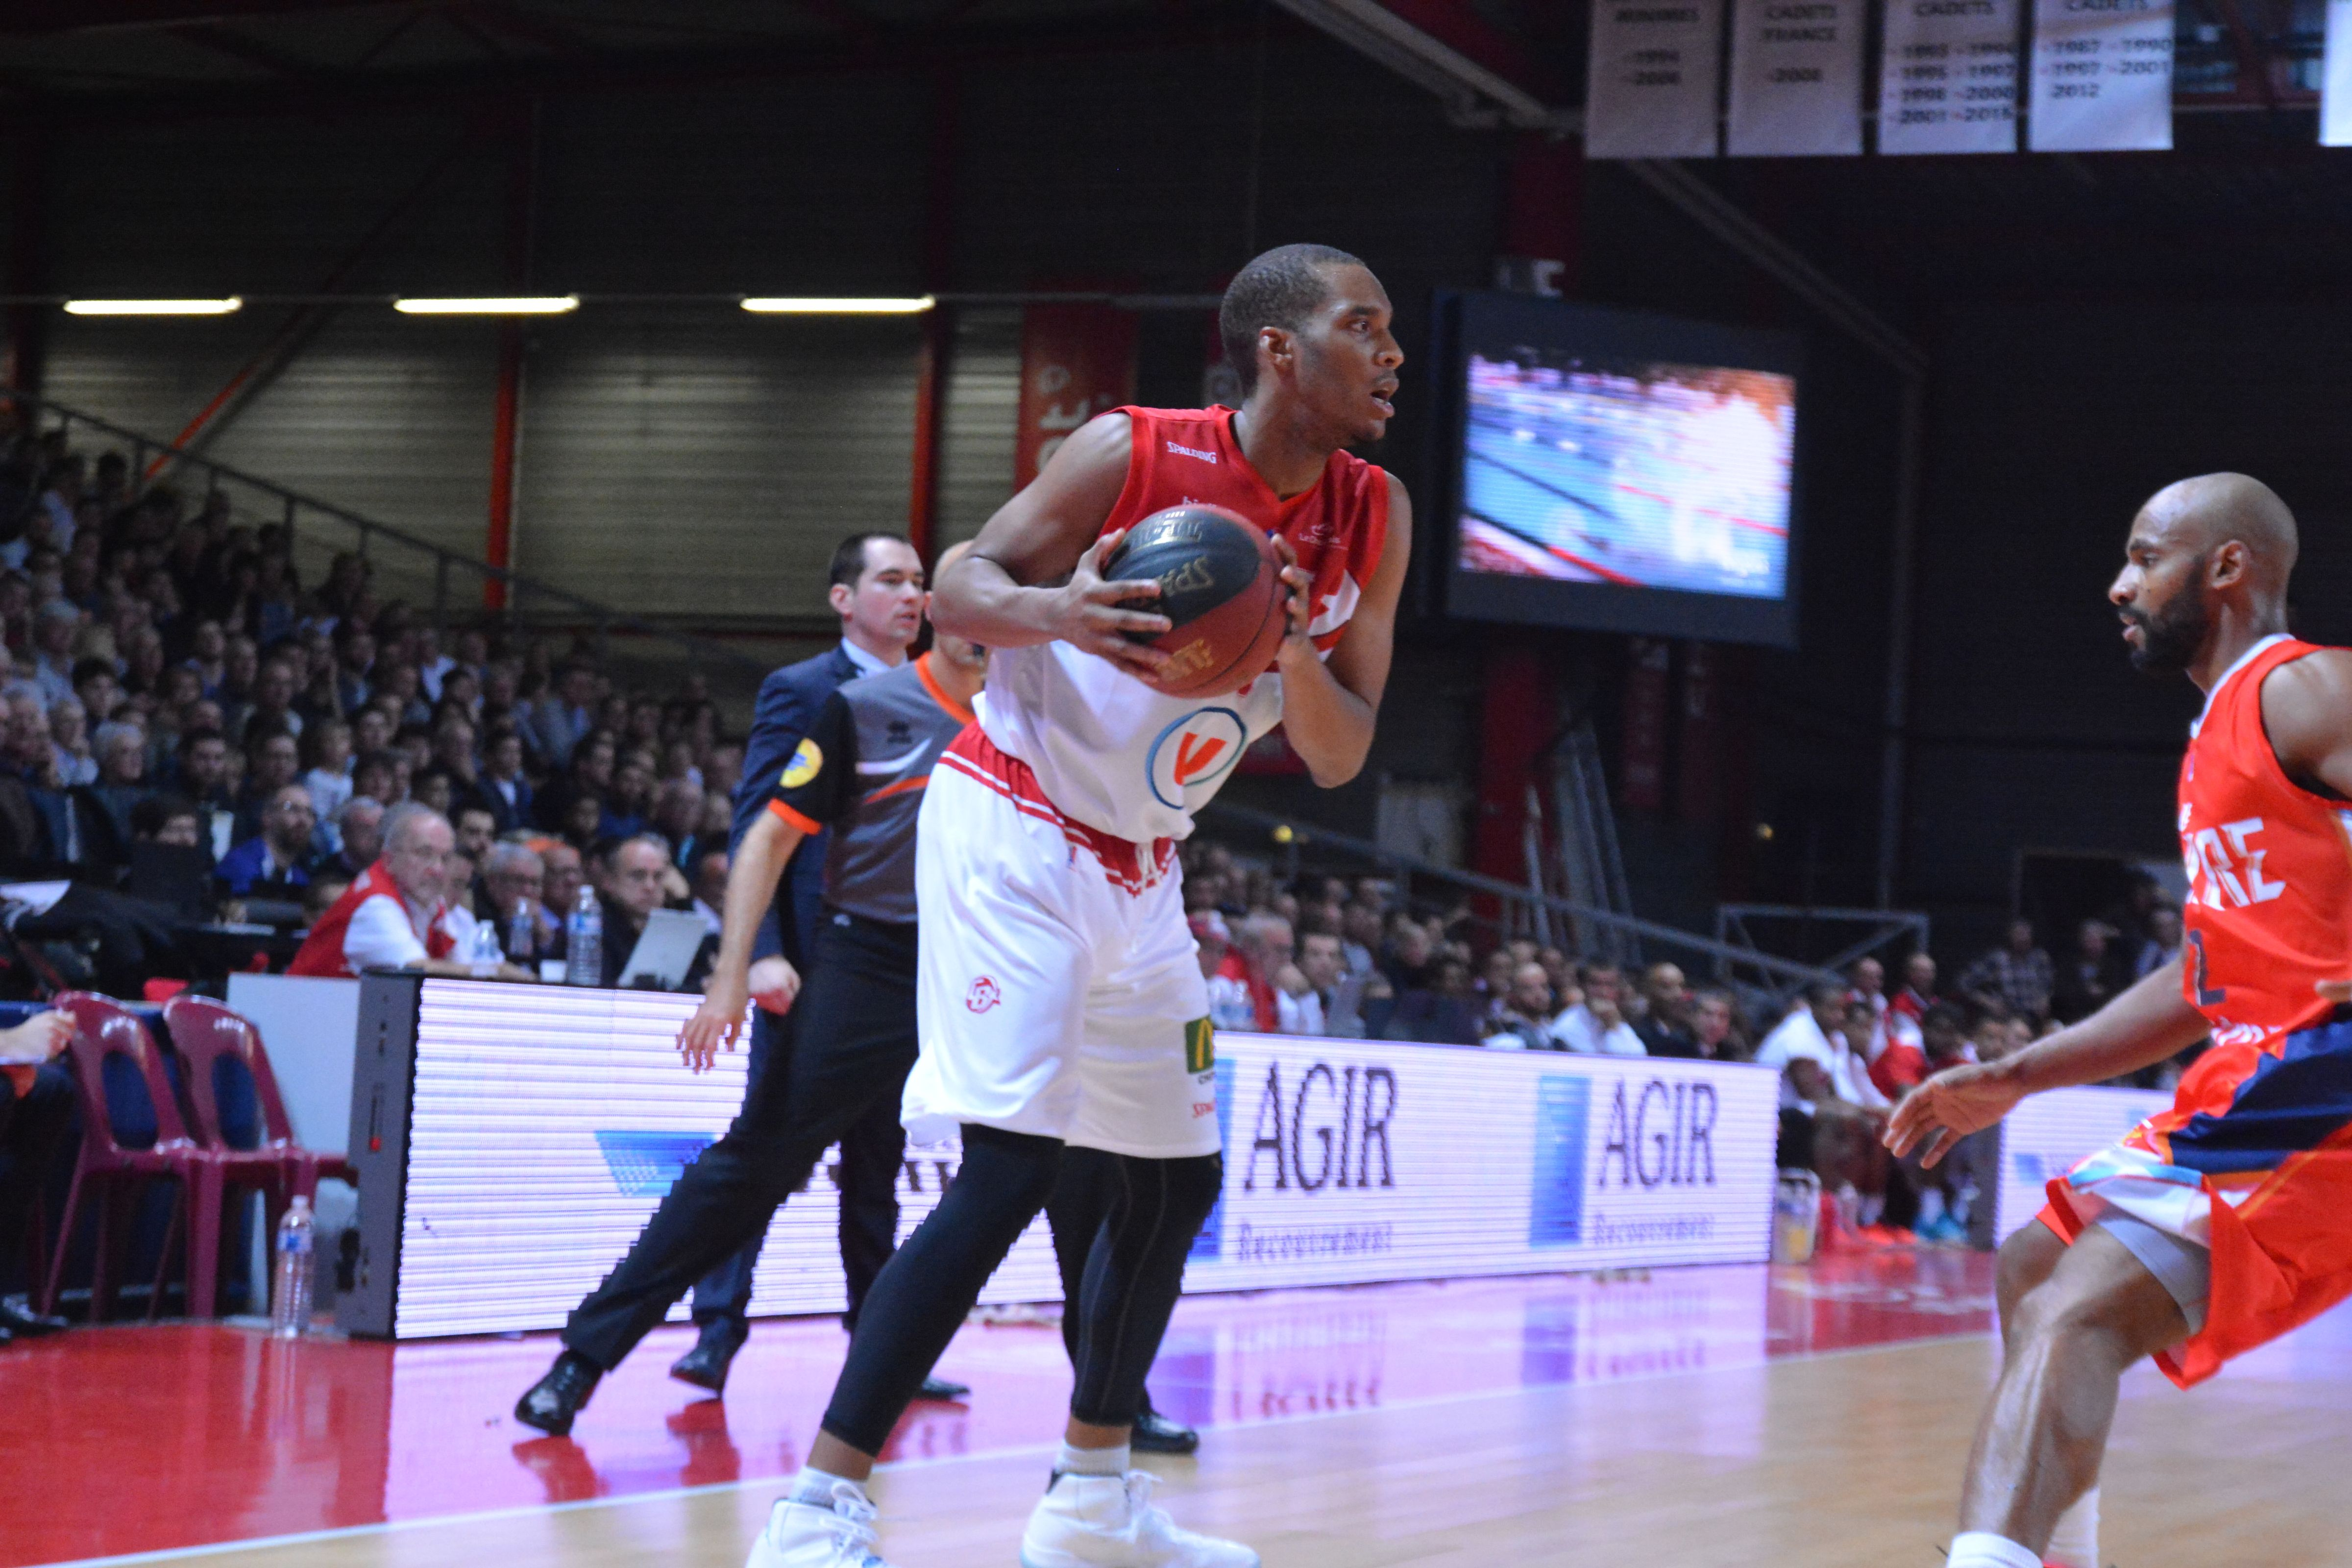 Match Cholet BASKET- STB Le Havre (05.12.15)